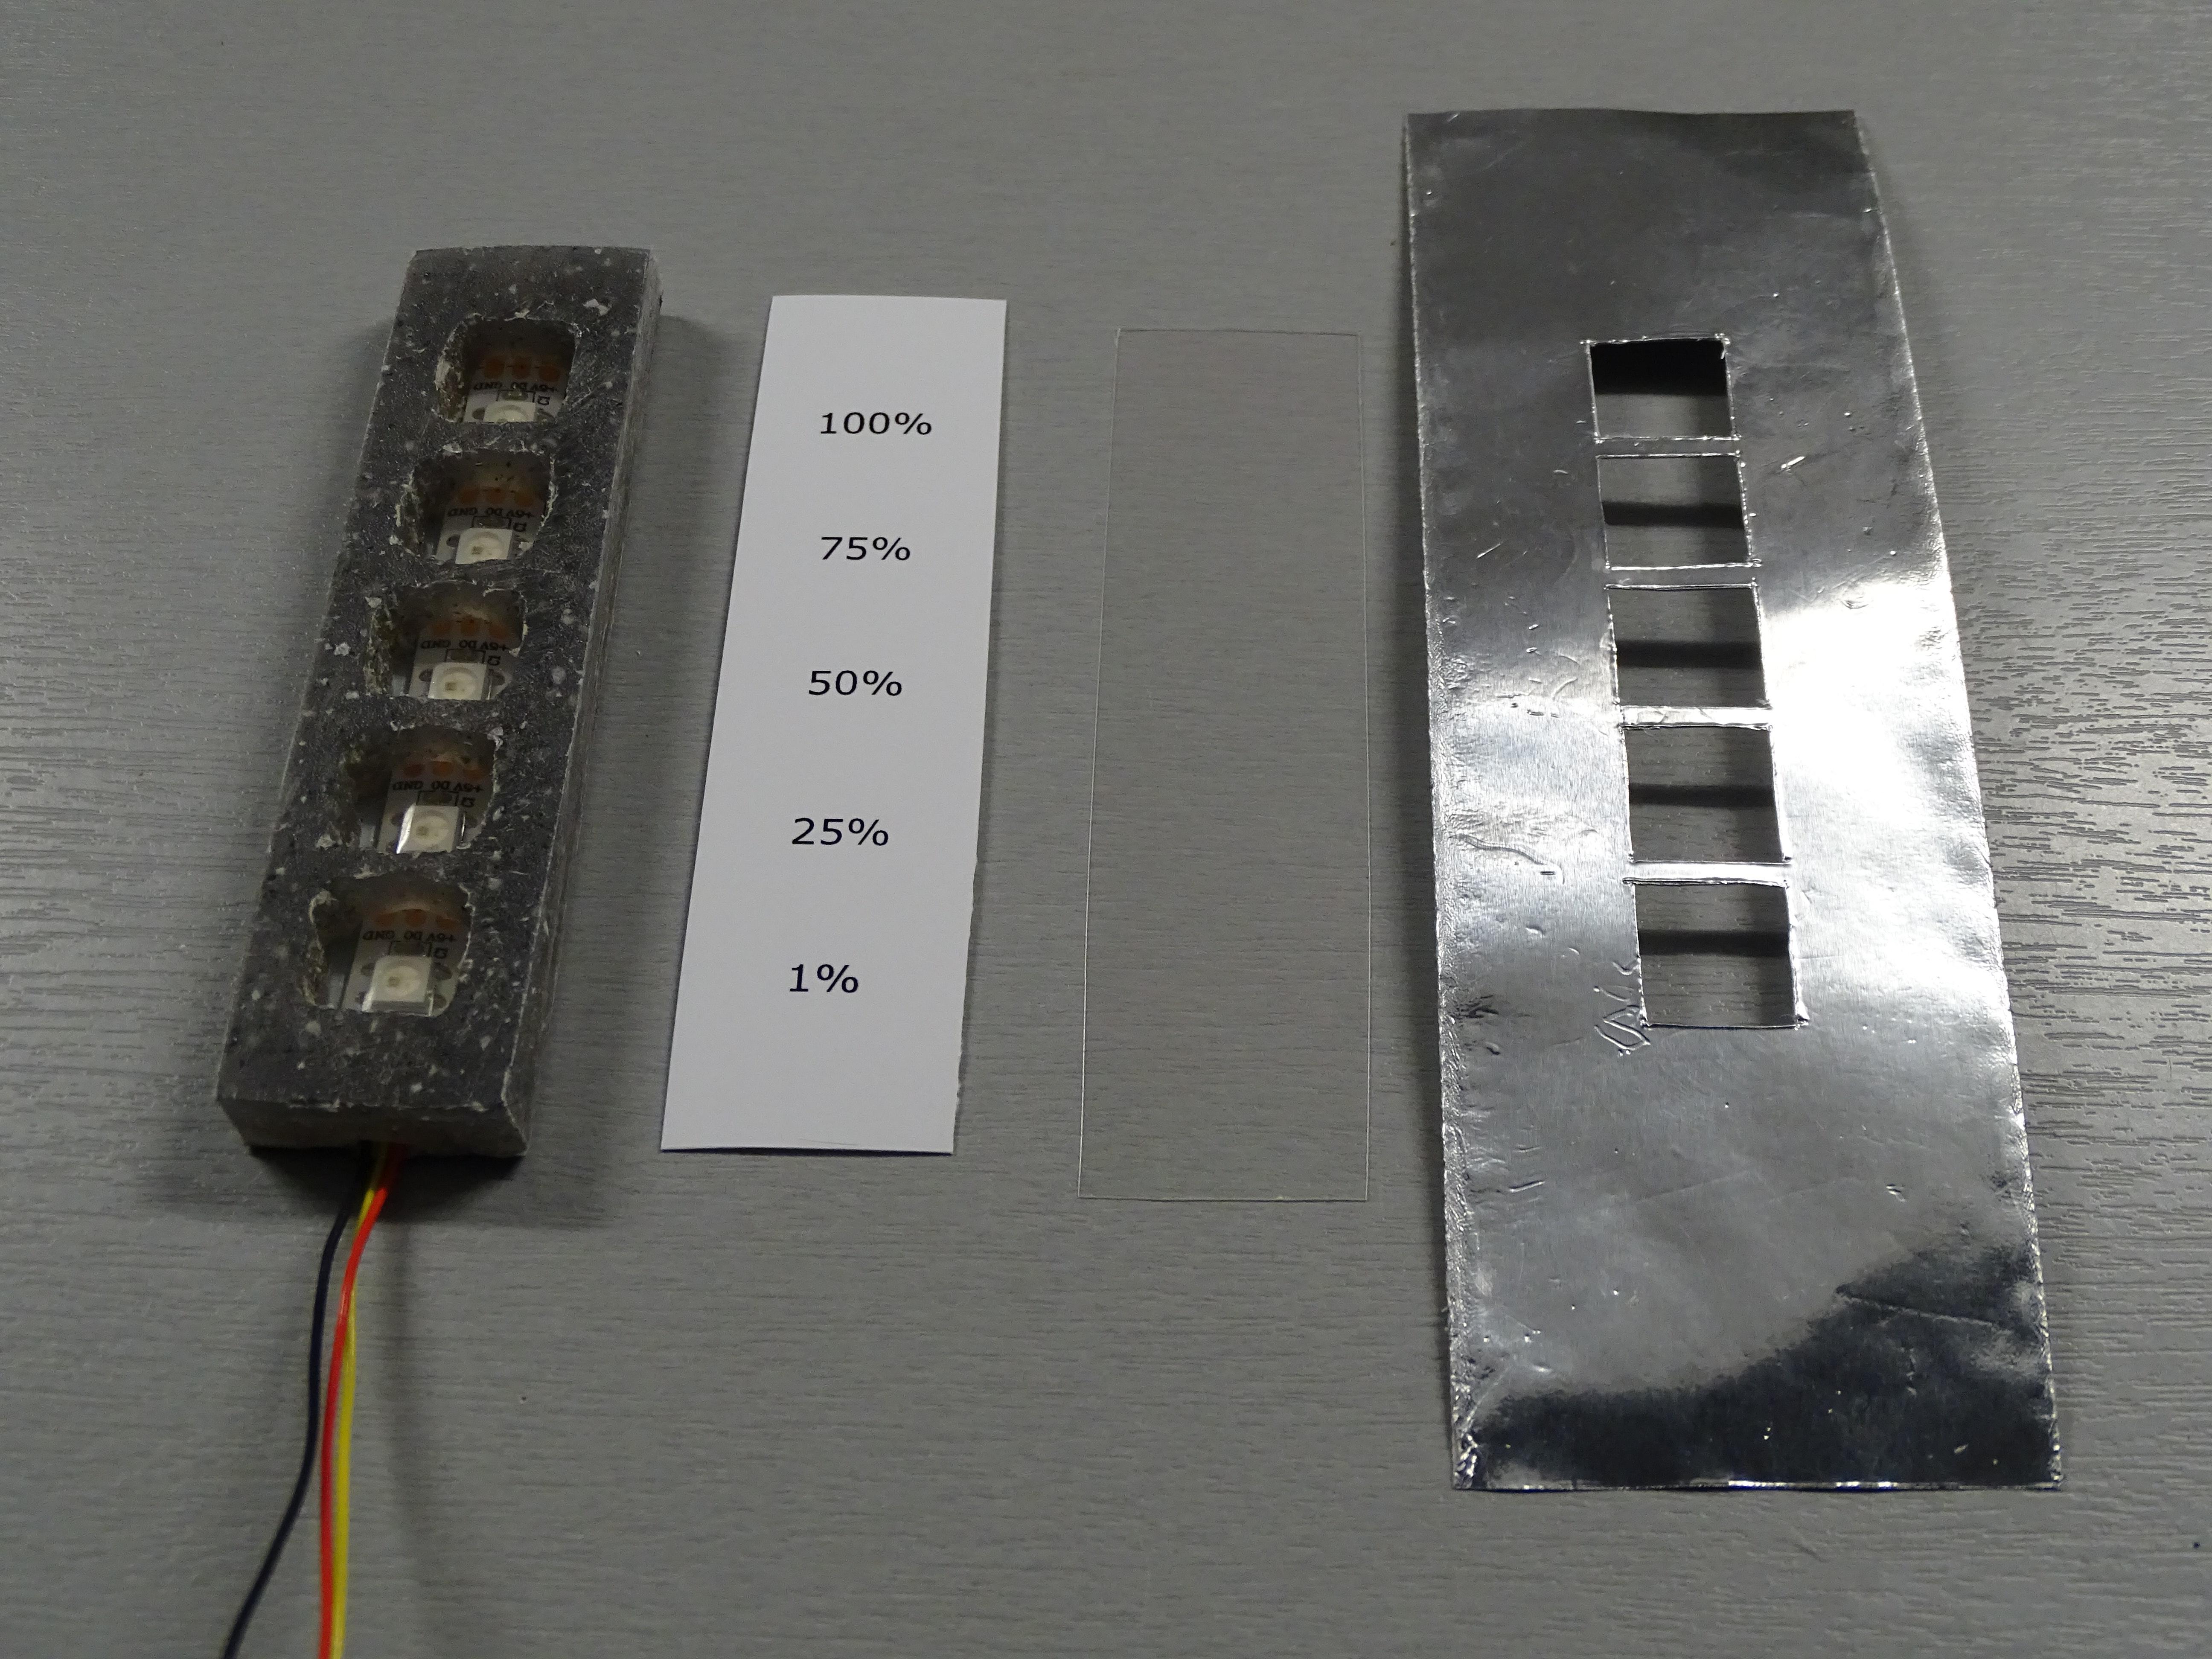 Water Level Indicator Build Circuit